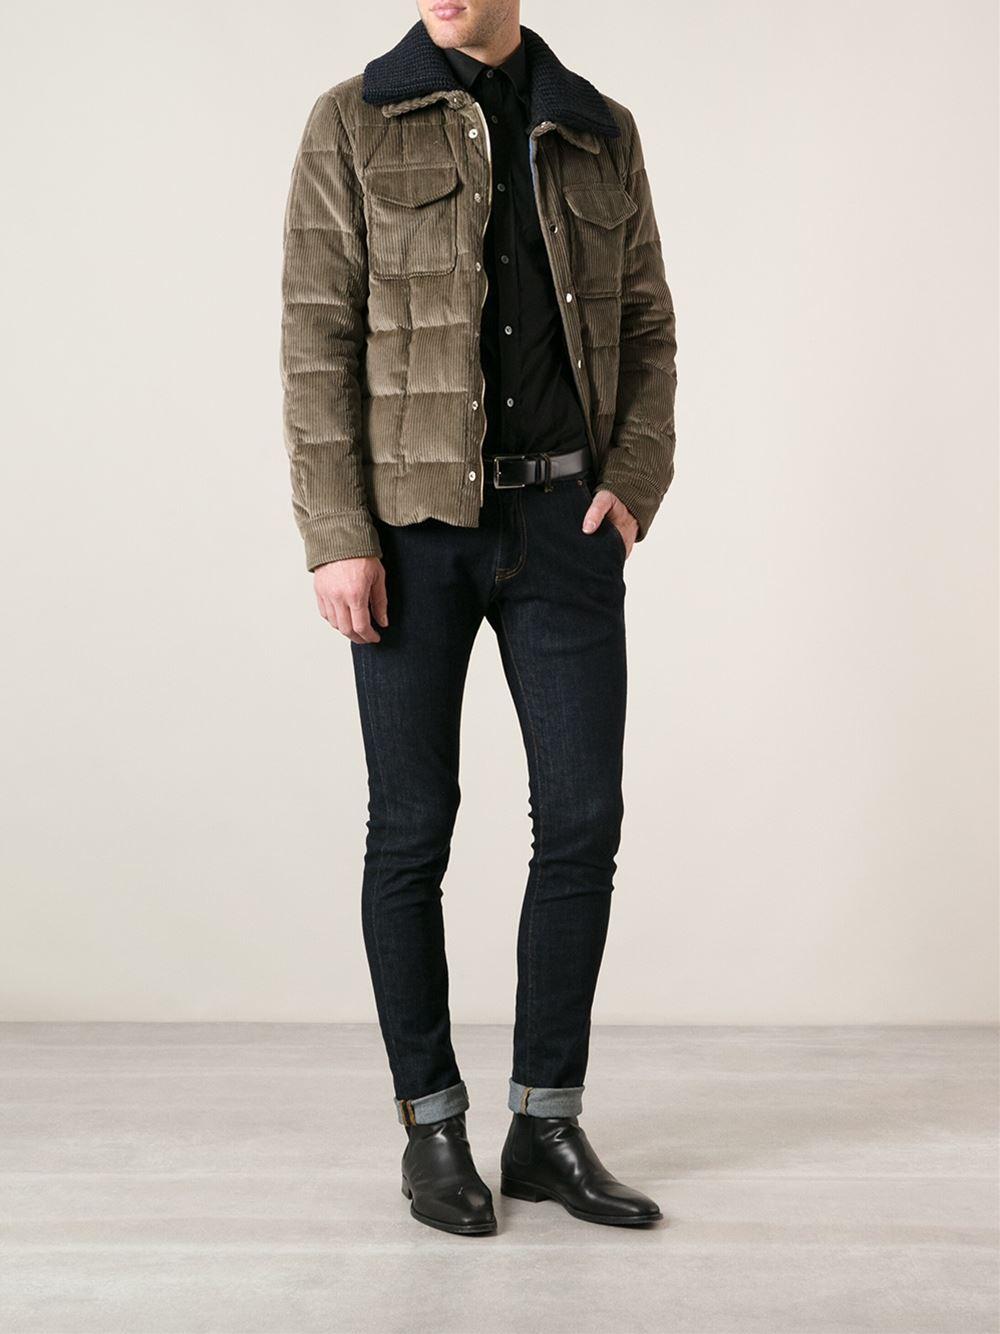 lyst dolce gabbana padded corduroy jacket in brown for men. Black Bedroom Furniture Sets. Home Design Ideas